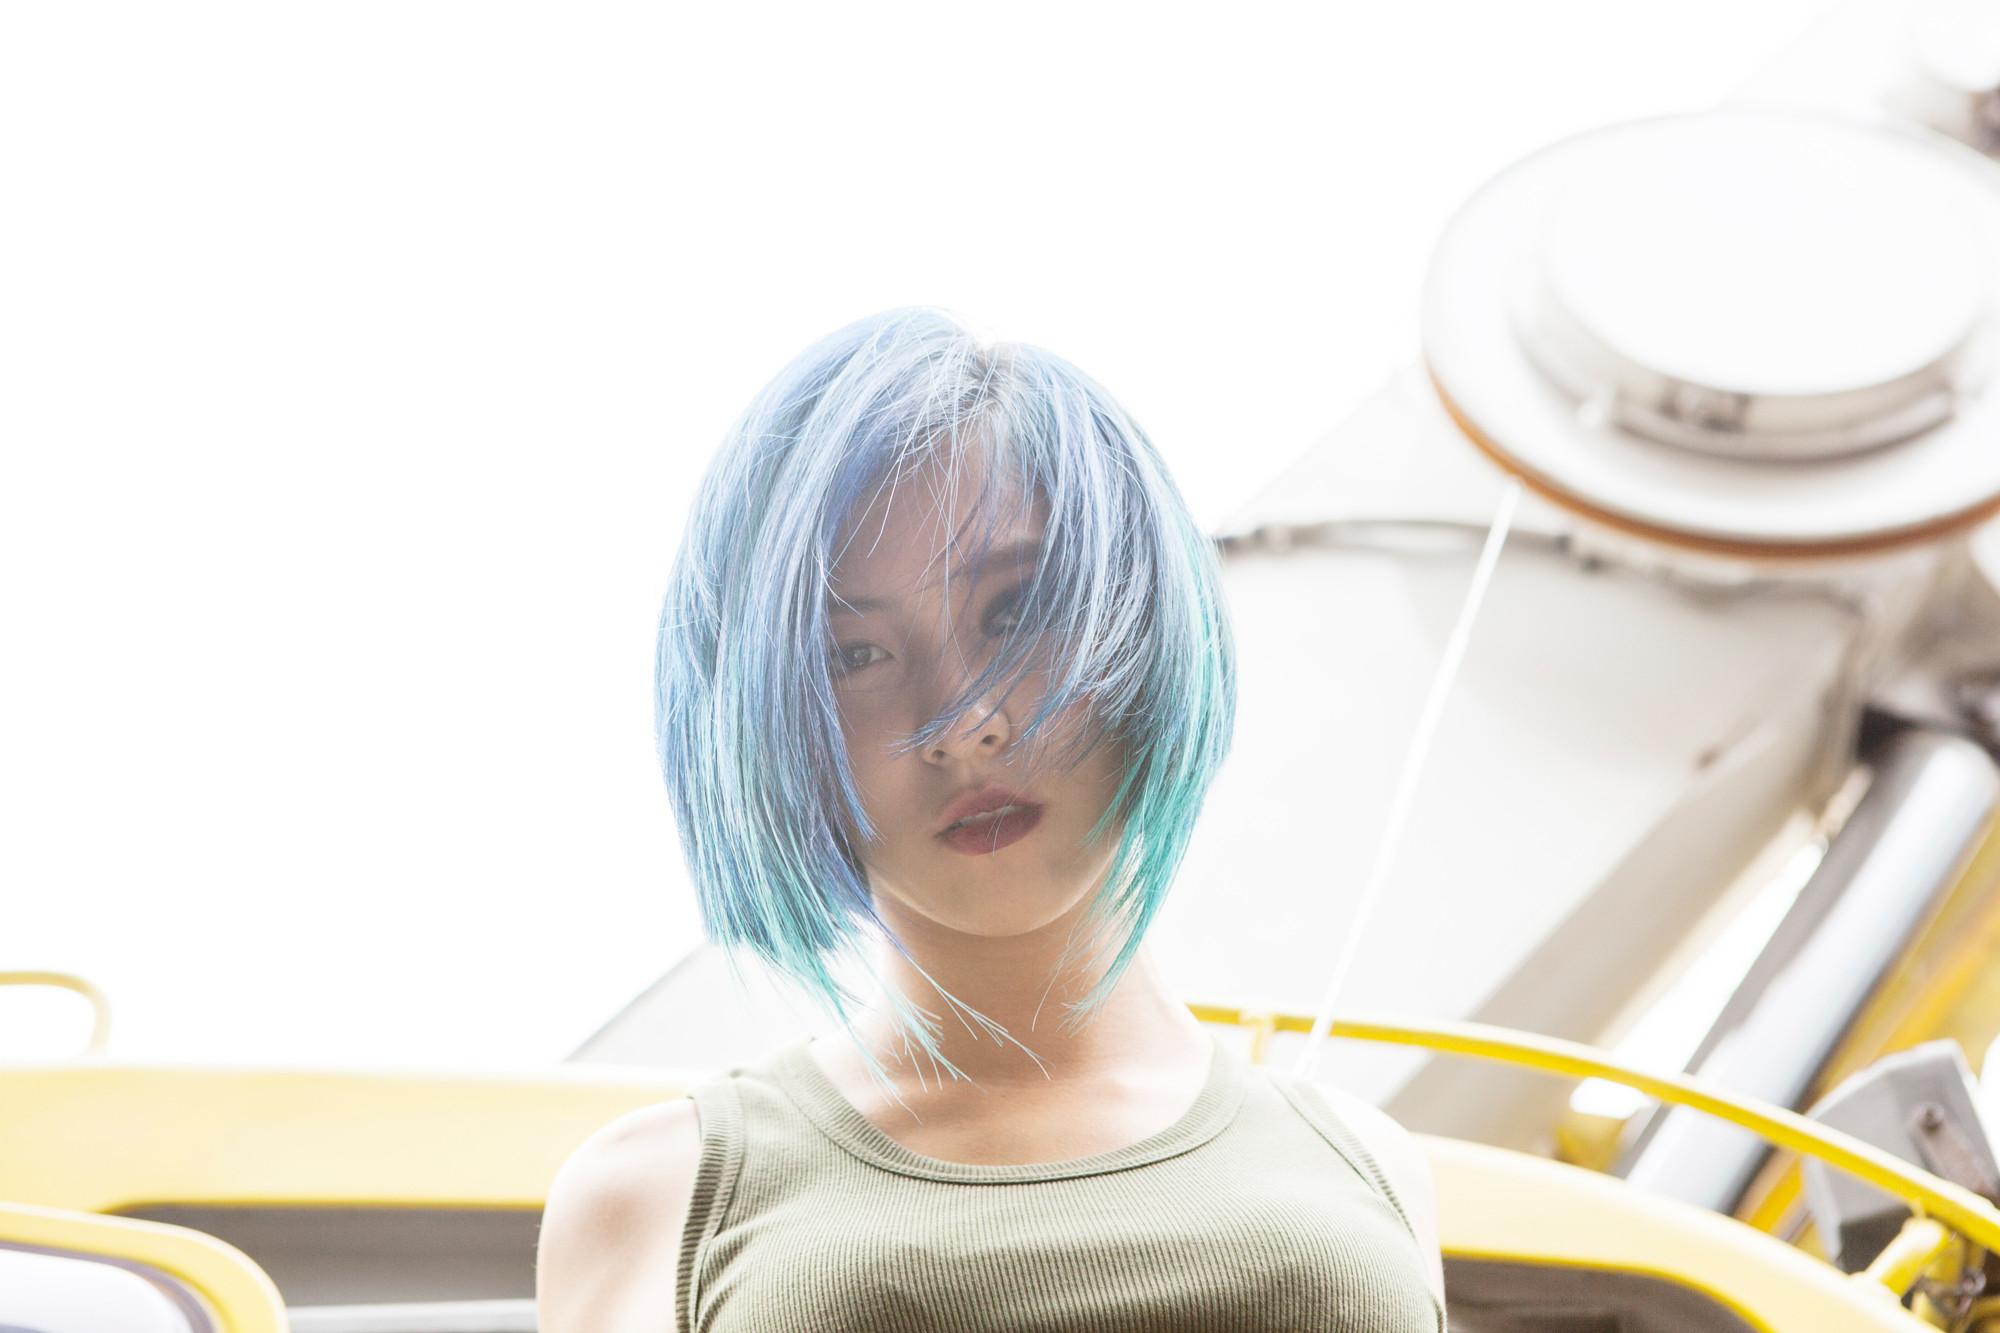 20140729_seoulbeats_f(x)_luna_redlight2